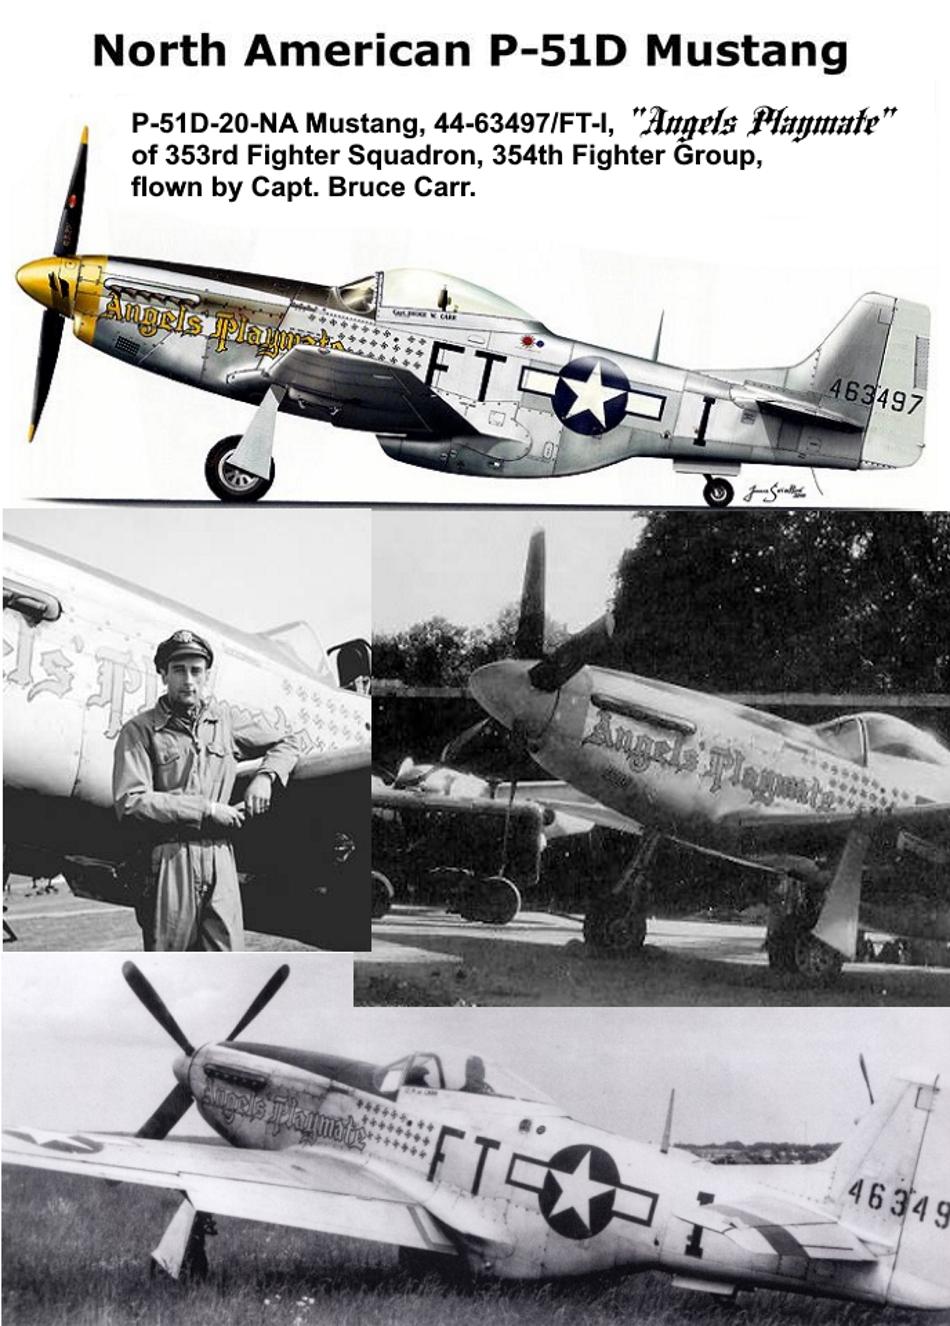 NORTH AMERICAN P-51 MUSTANG P51d-123